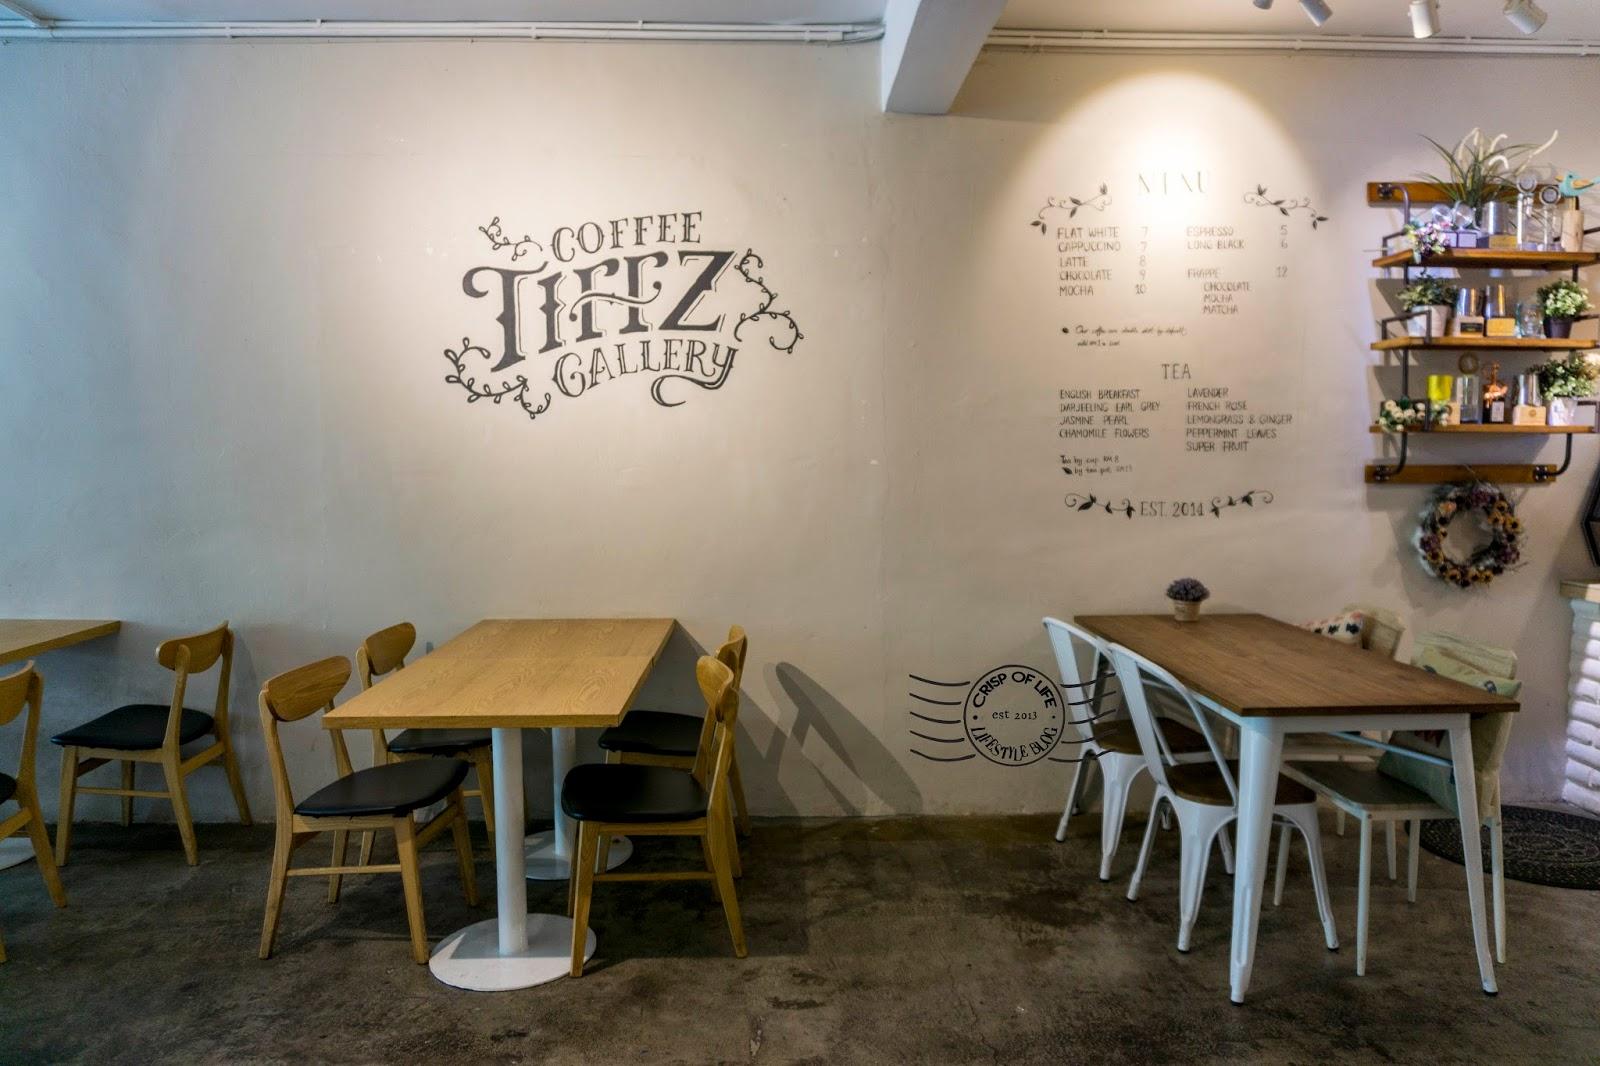 Tiffz Coffee Gallery Cafe Alor Setar Kedah